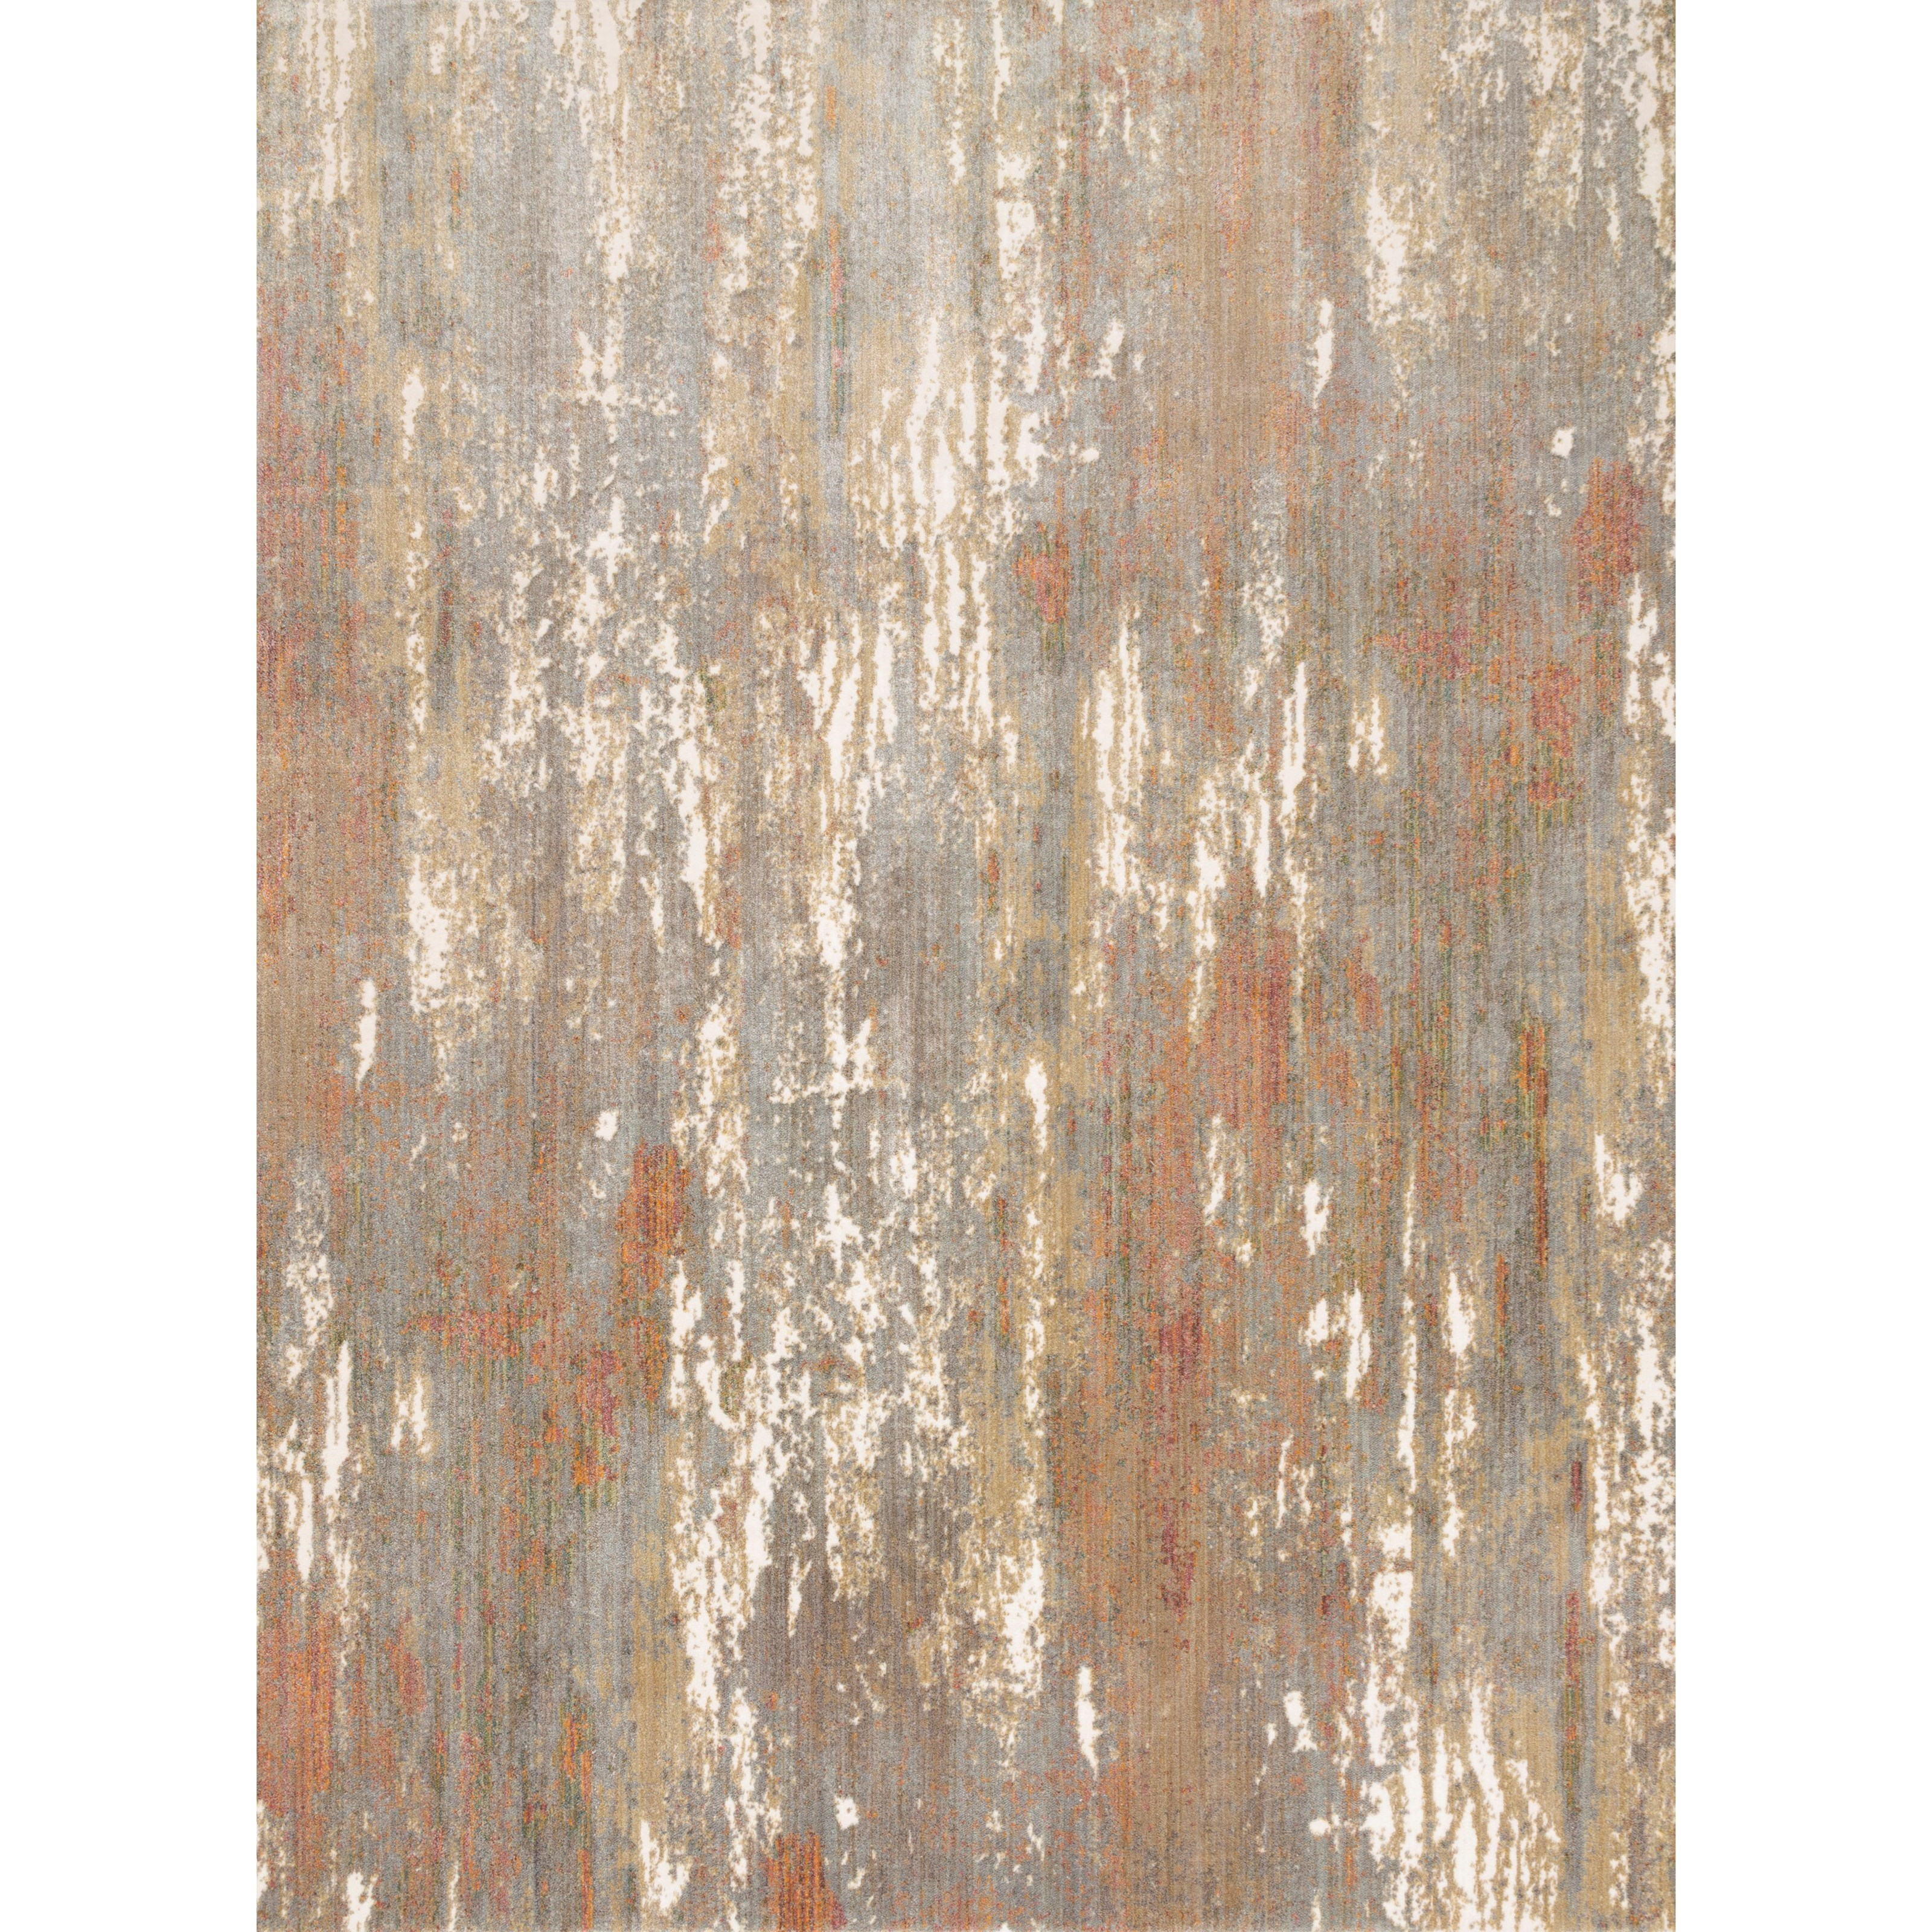 "Reid 9'6"" x 13' Granite Rug by Loloi Rugs at Virginia Furniture Market"